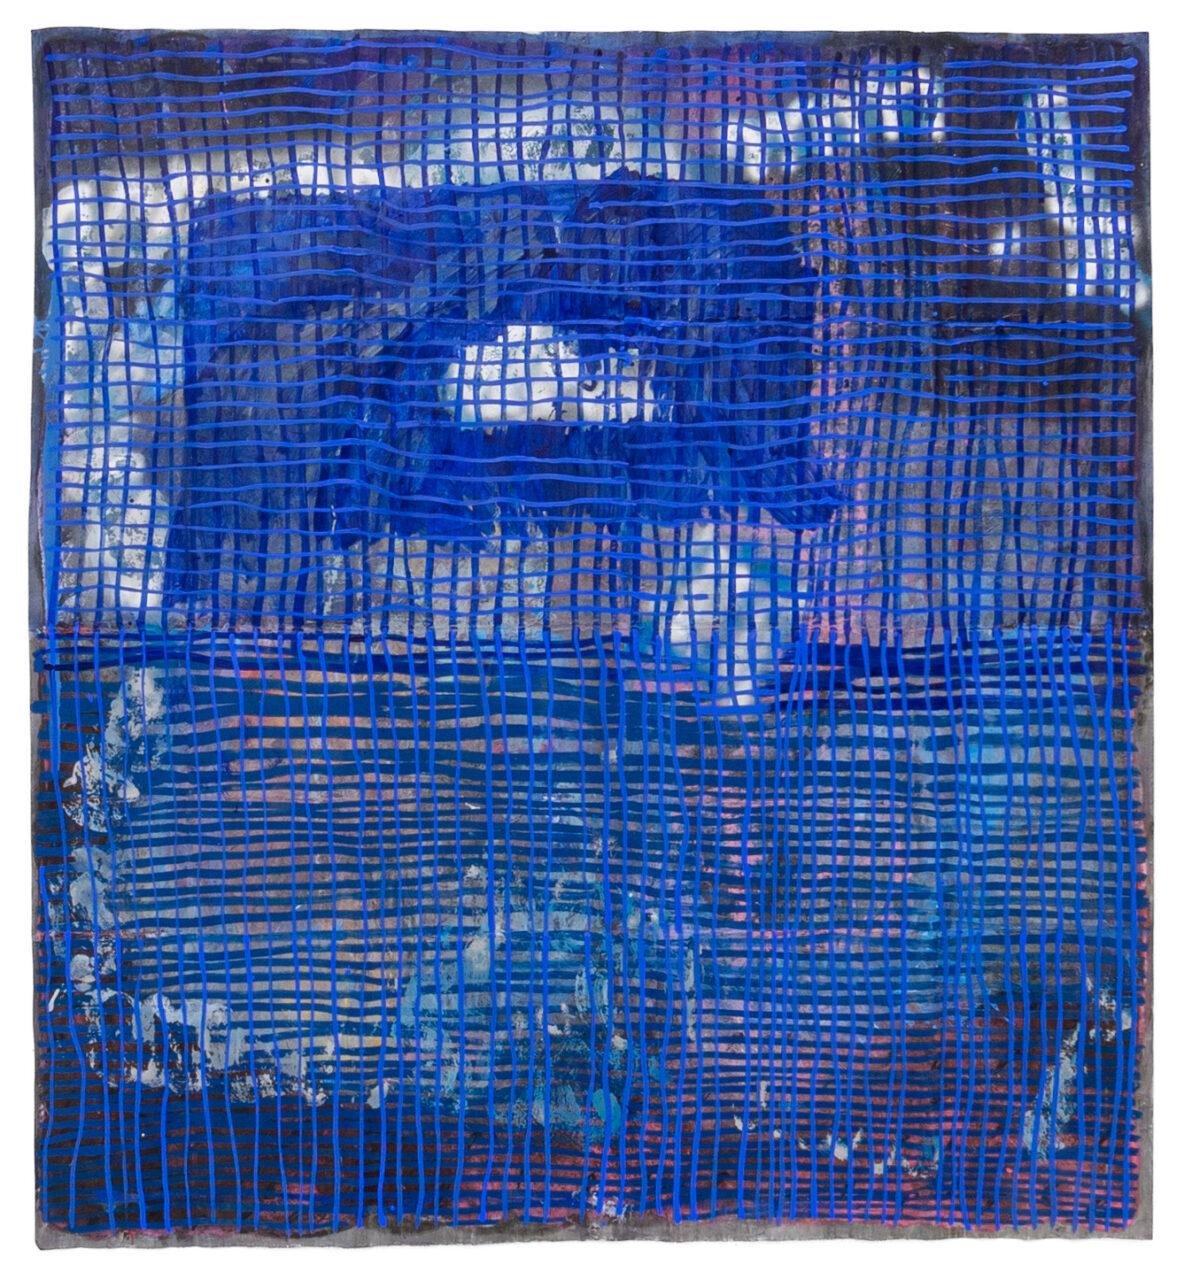 hideout note, 2021, oil on paper, 250 x 218 cm